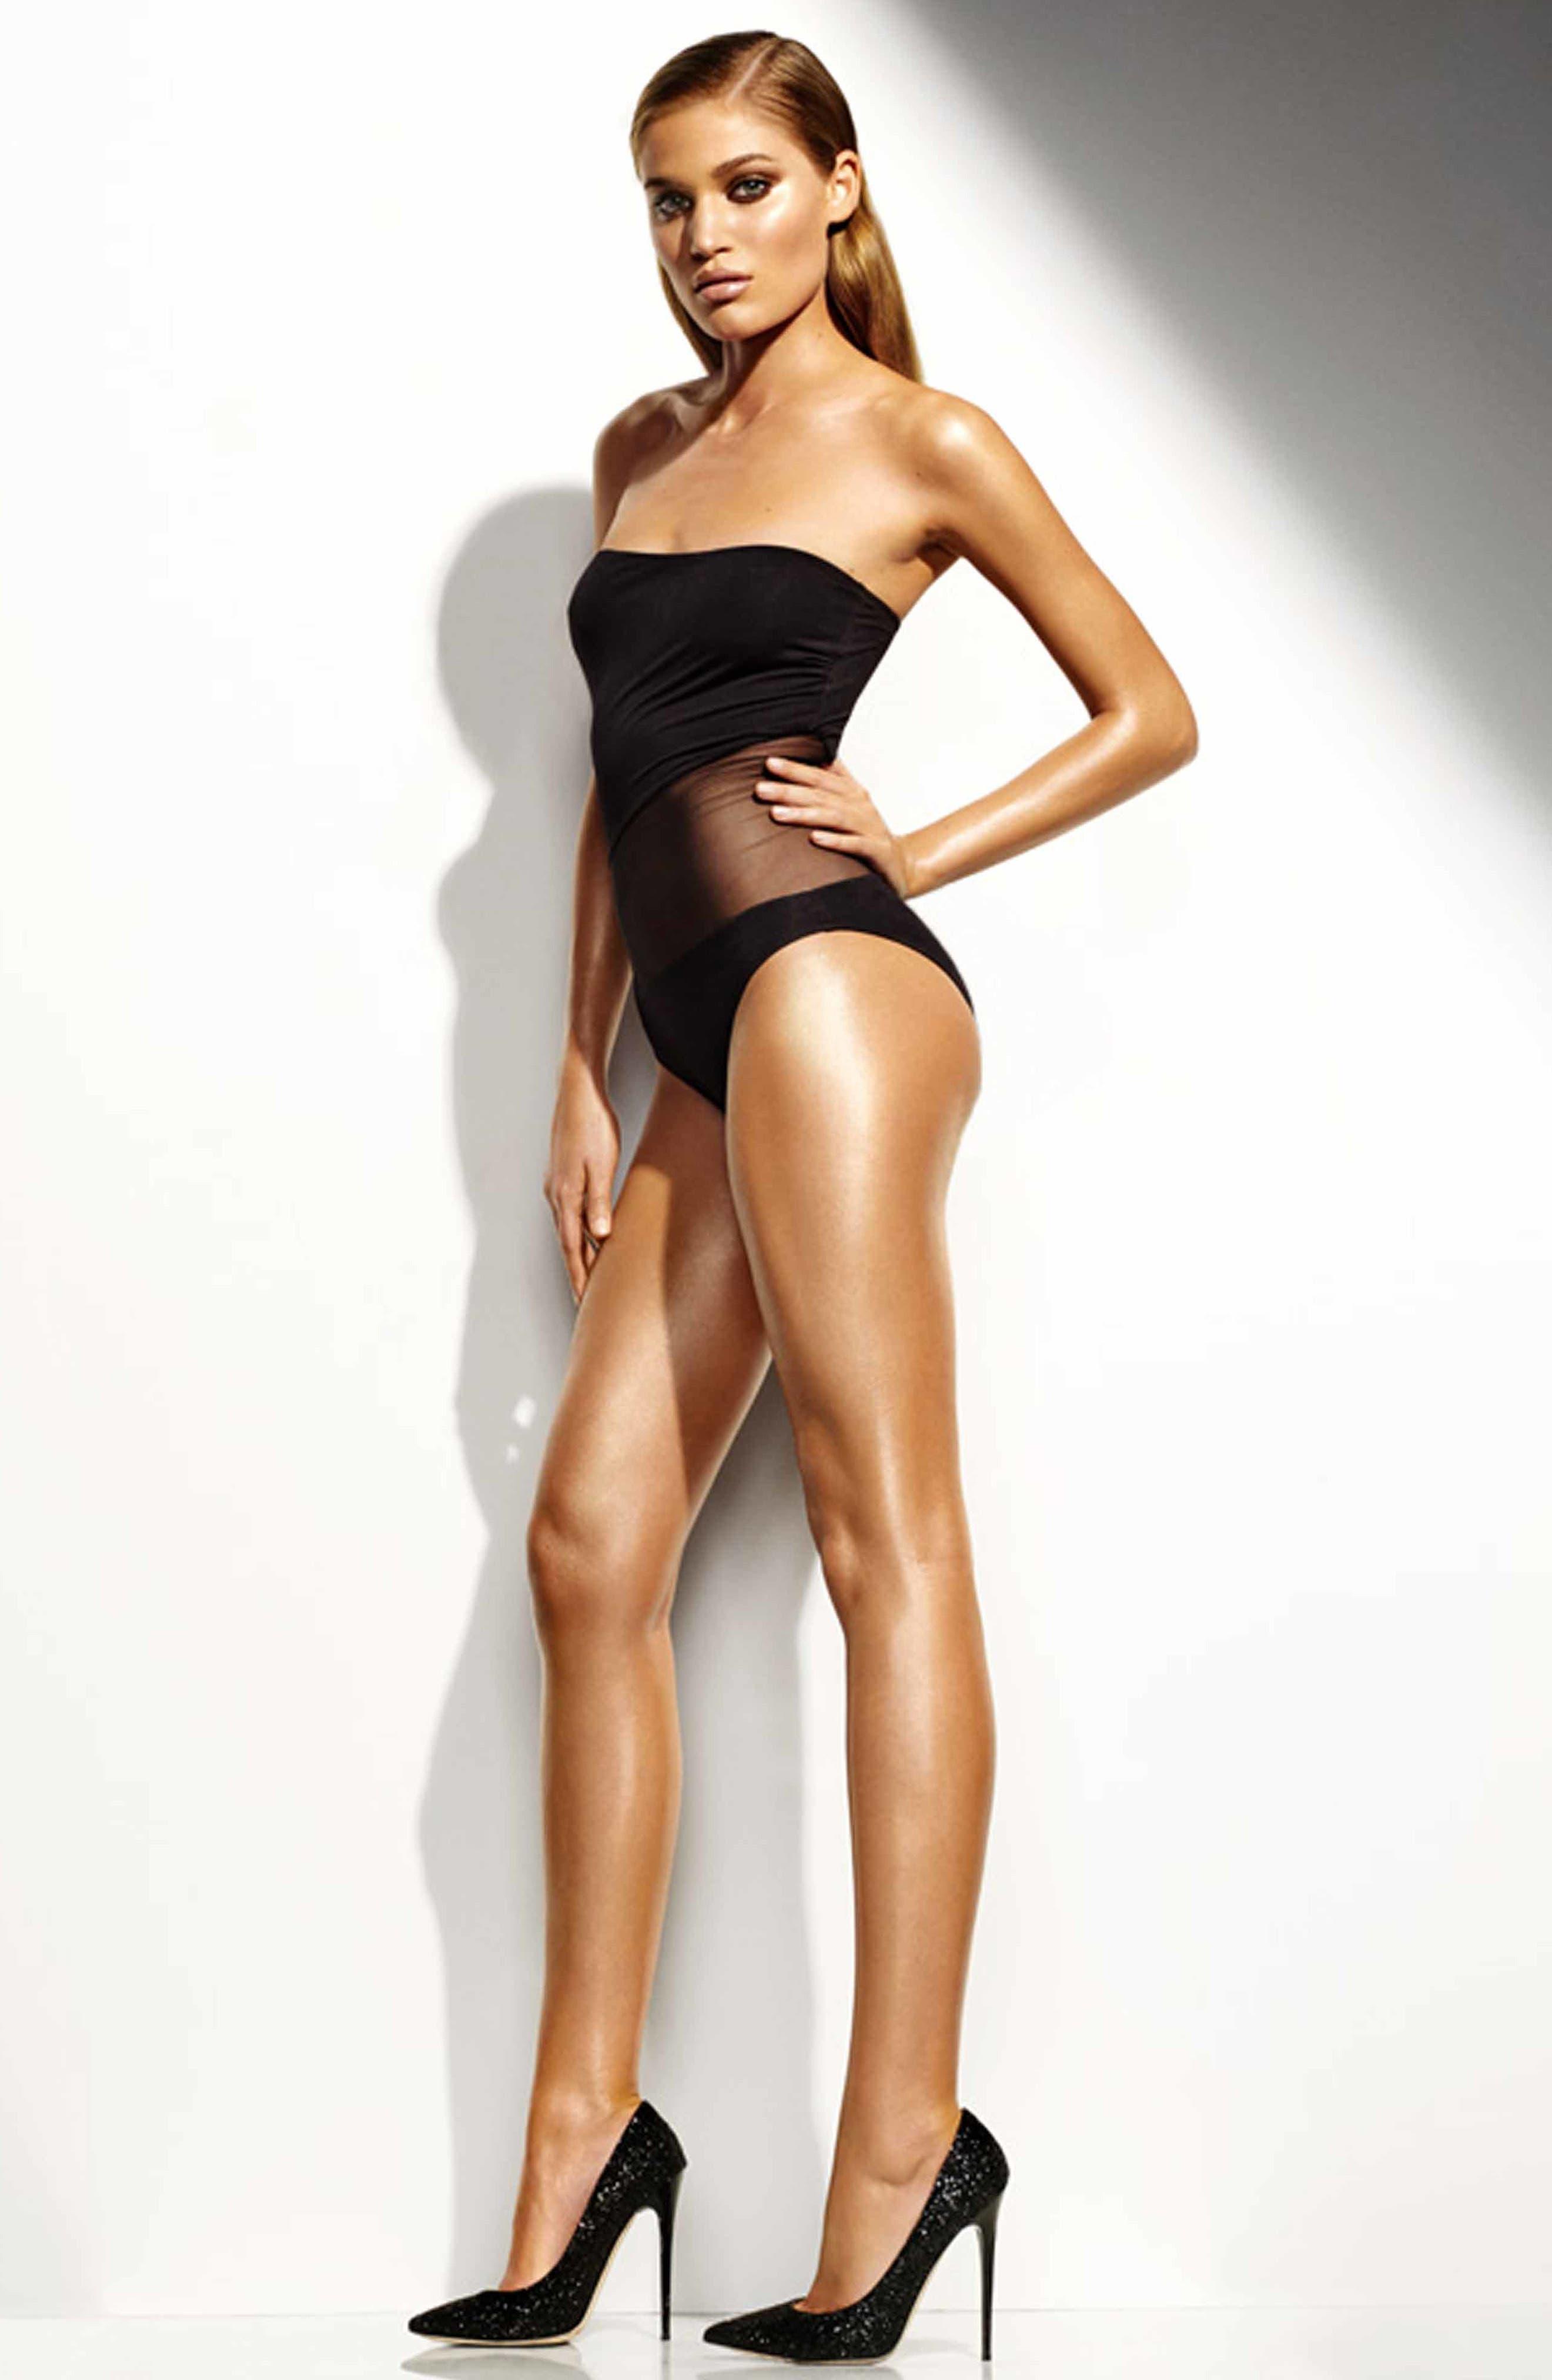 CHARLOTTE TILBURY, Supermodel Body Slimmer Shimmer Shape, Hydrate & Glow, Alternate thumbnail 4, color, NO COLOR